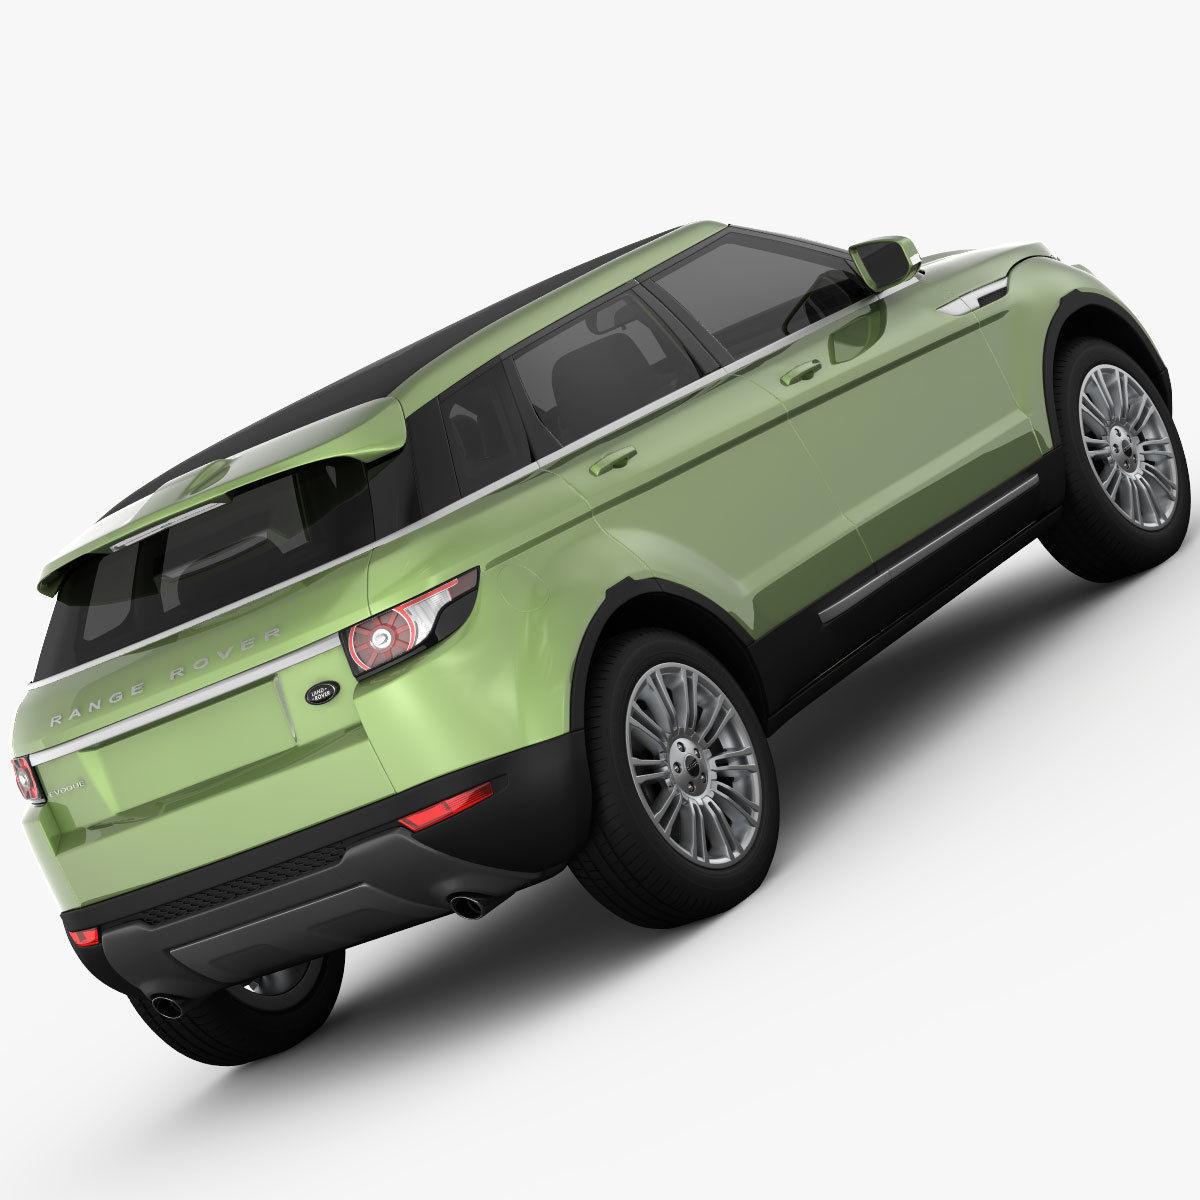 https://img-new.cgtrader.com/items/871078/28f25e8952/range-rover-evoque-5-door-2012-3d-model-max-obj-3ds-fbx.jpg